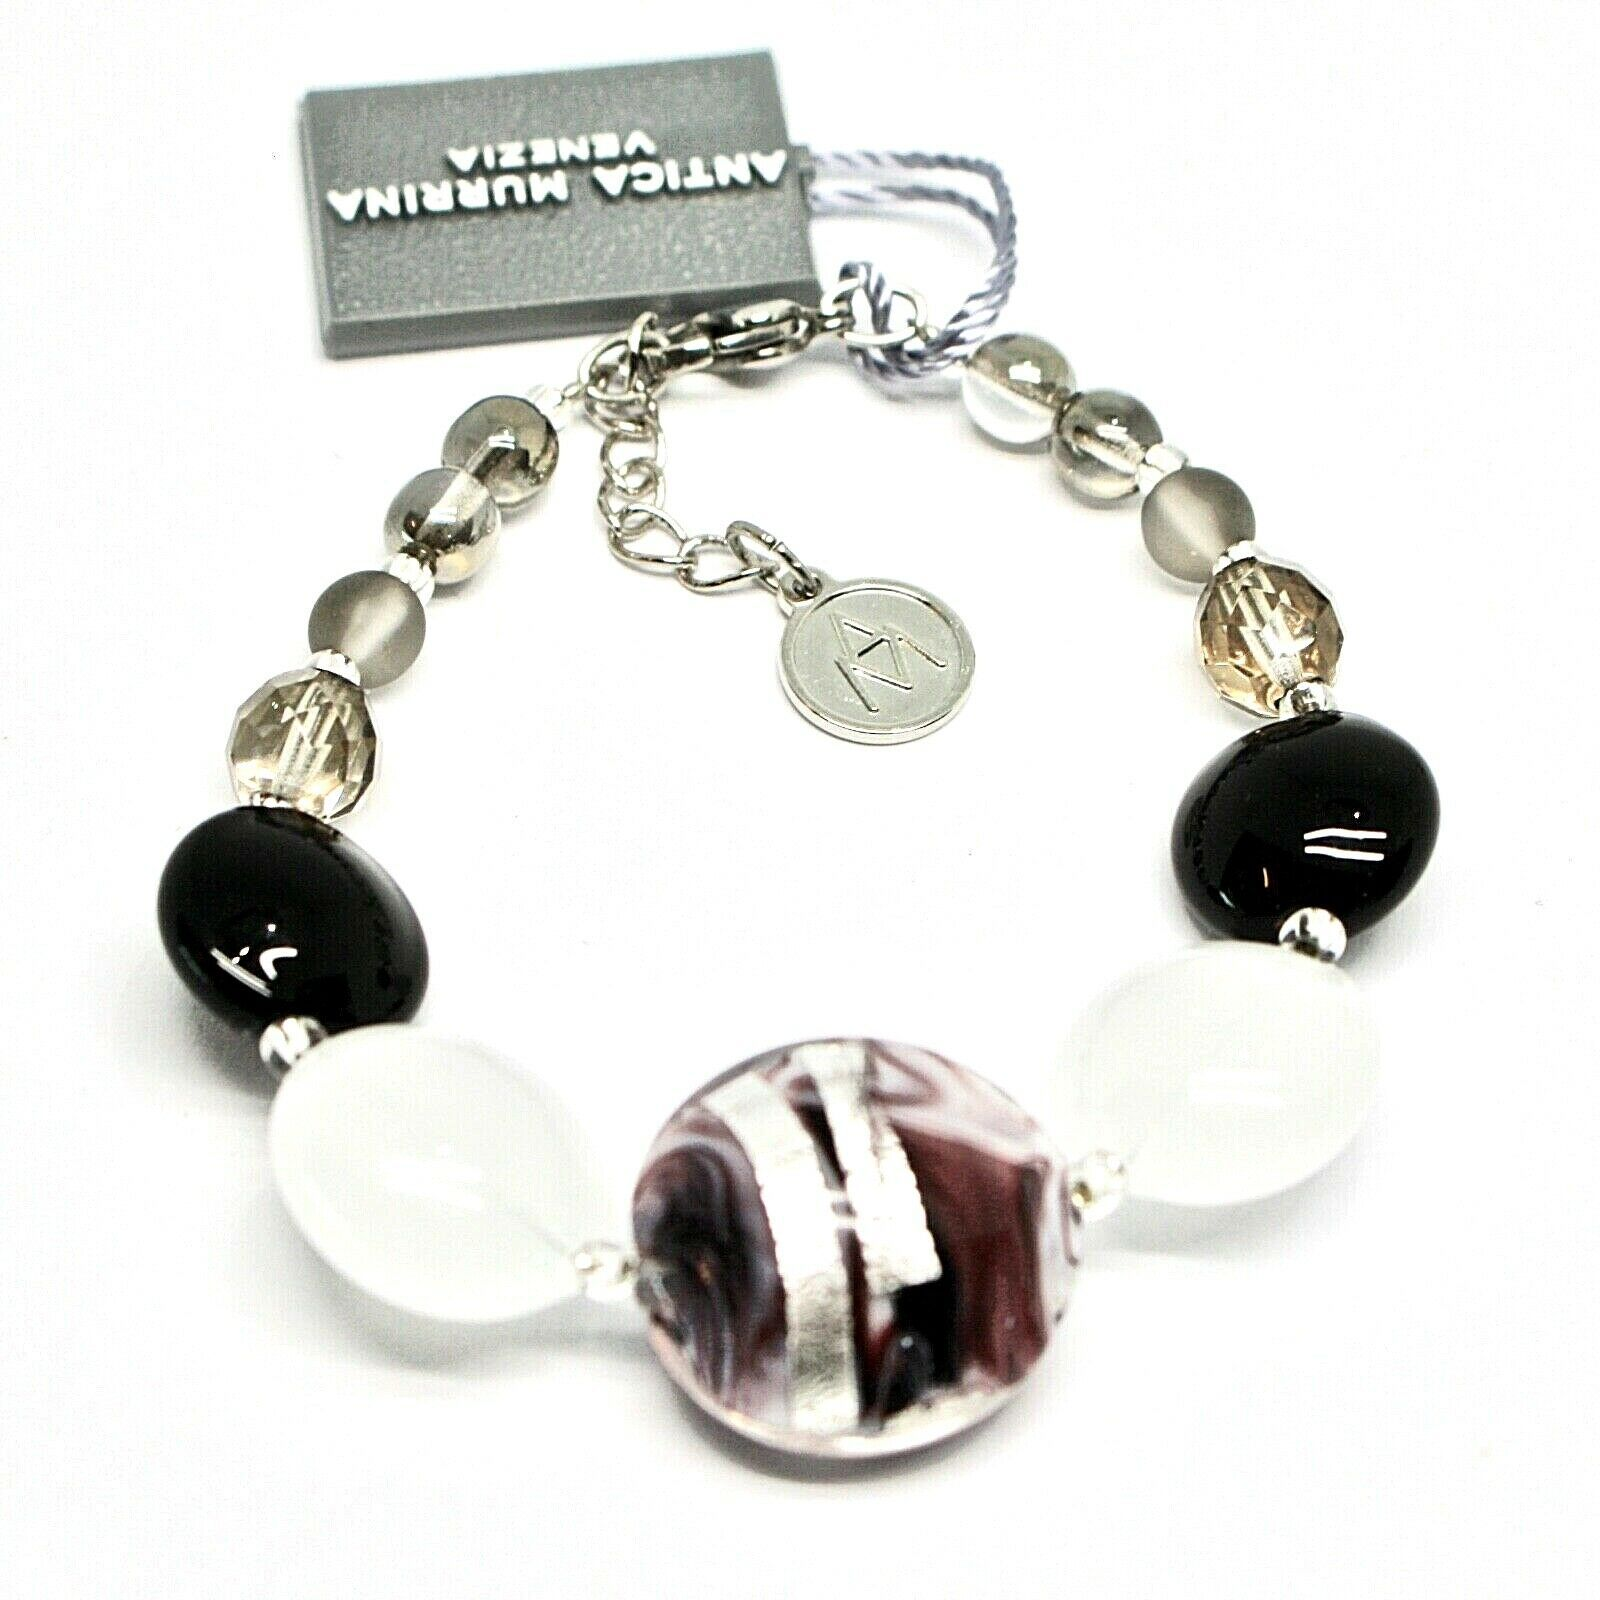 Bracelet Antique Murrina Venezia Lampwork Murano Glass Charm Bead Black & White